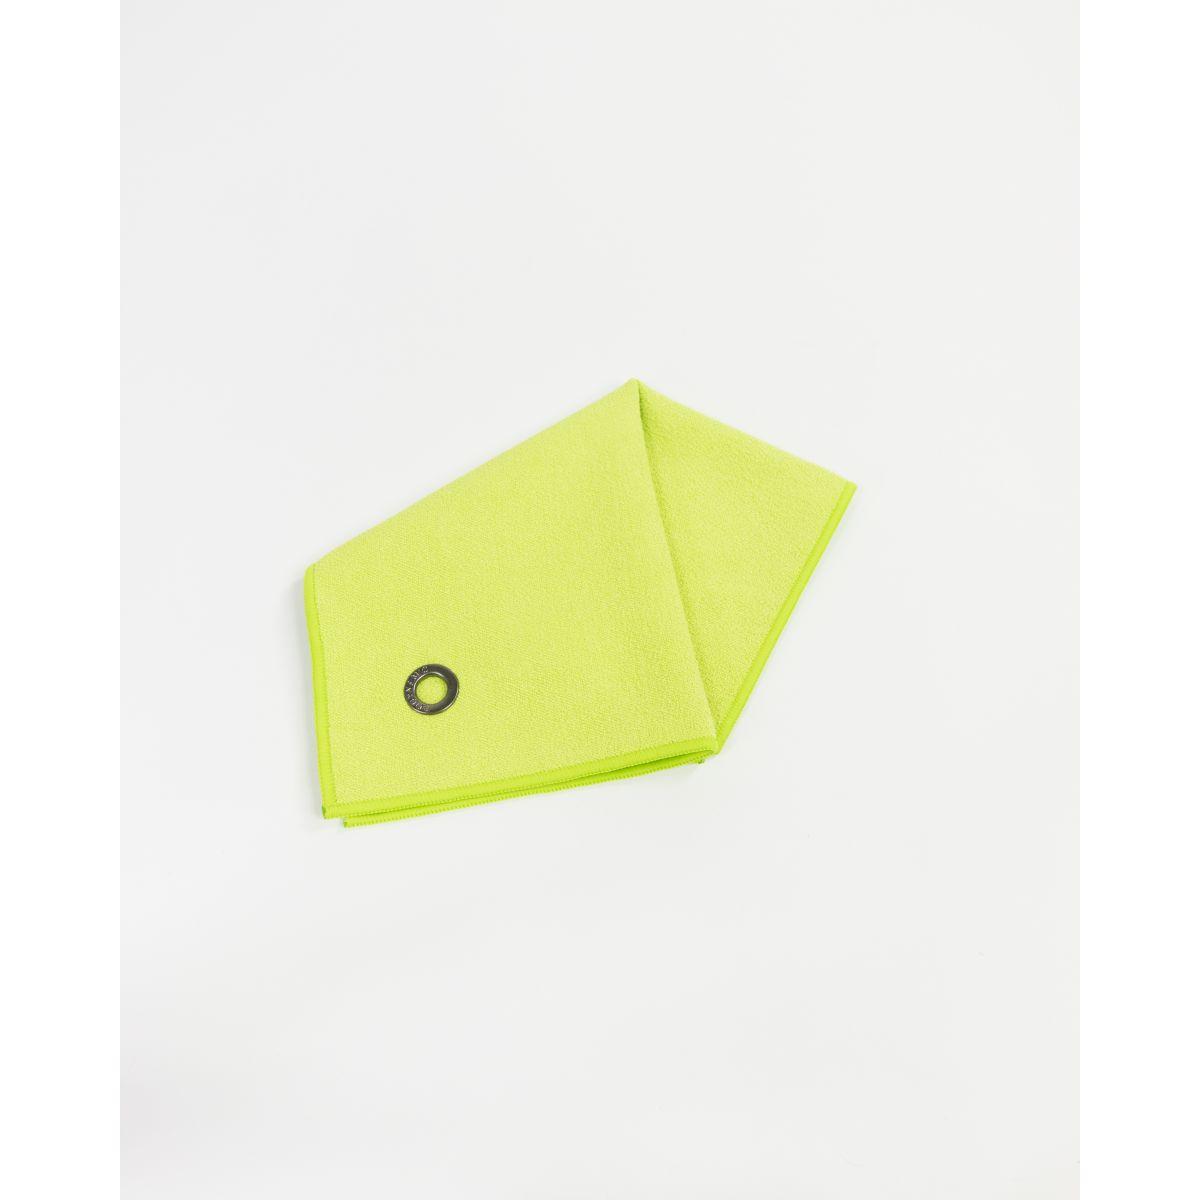 serviette mains visage en microfibre anuanua vert lime bodynamic. Black Bedroom Furniture Sets. Home Design Ideas